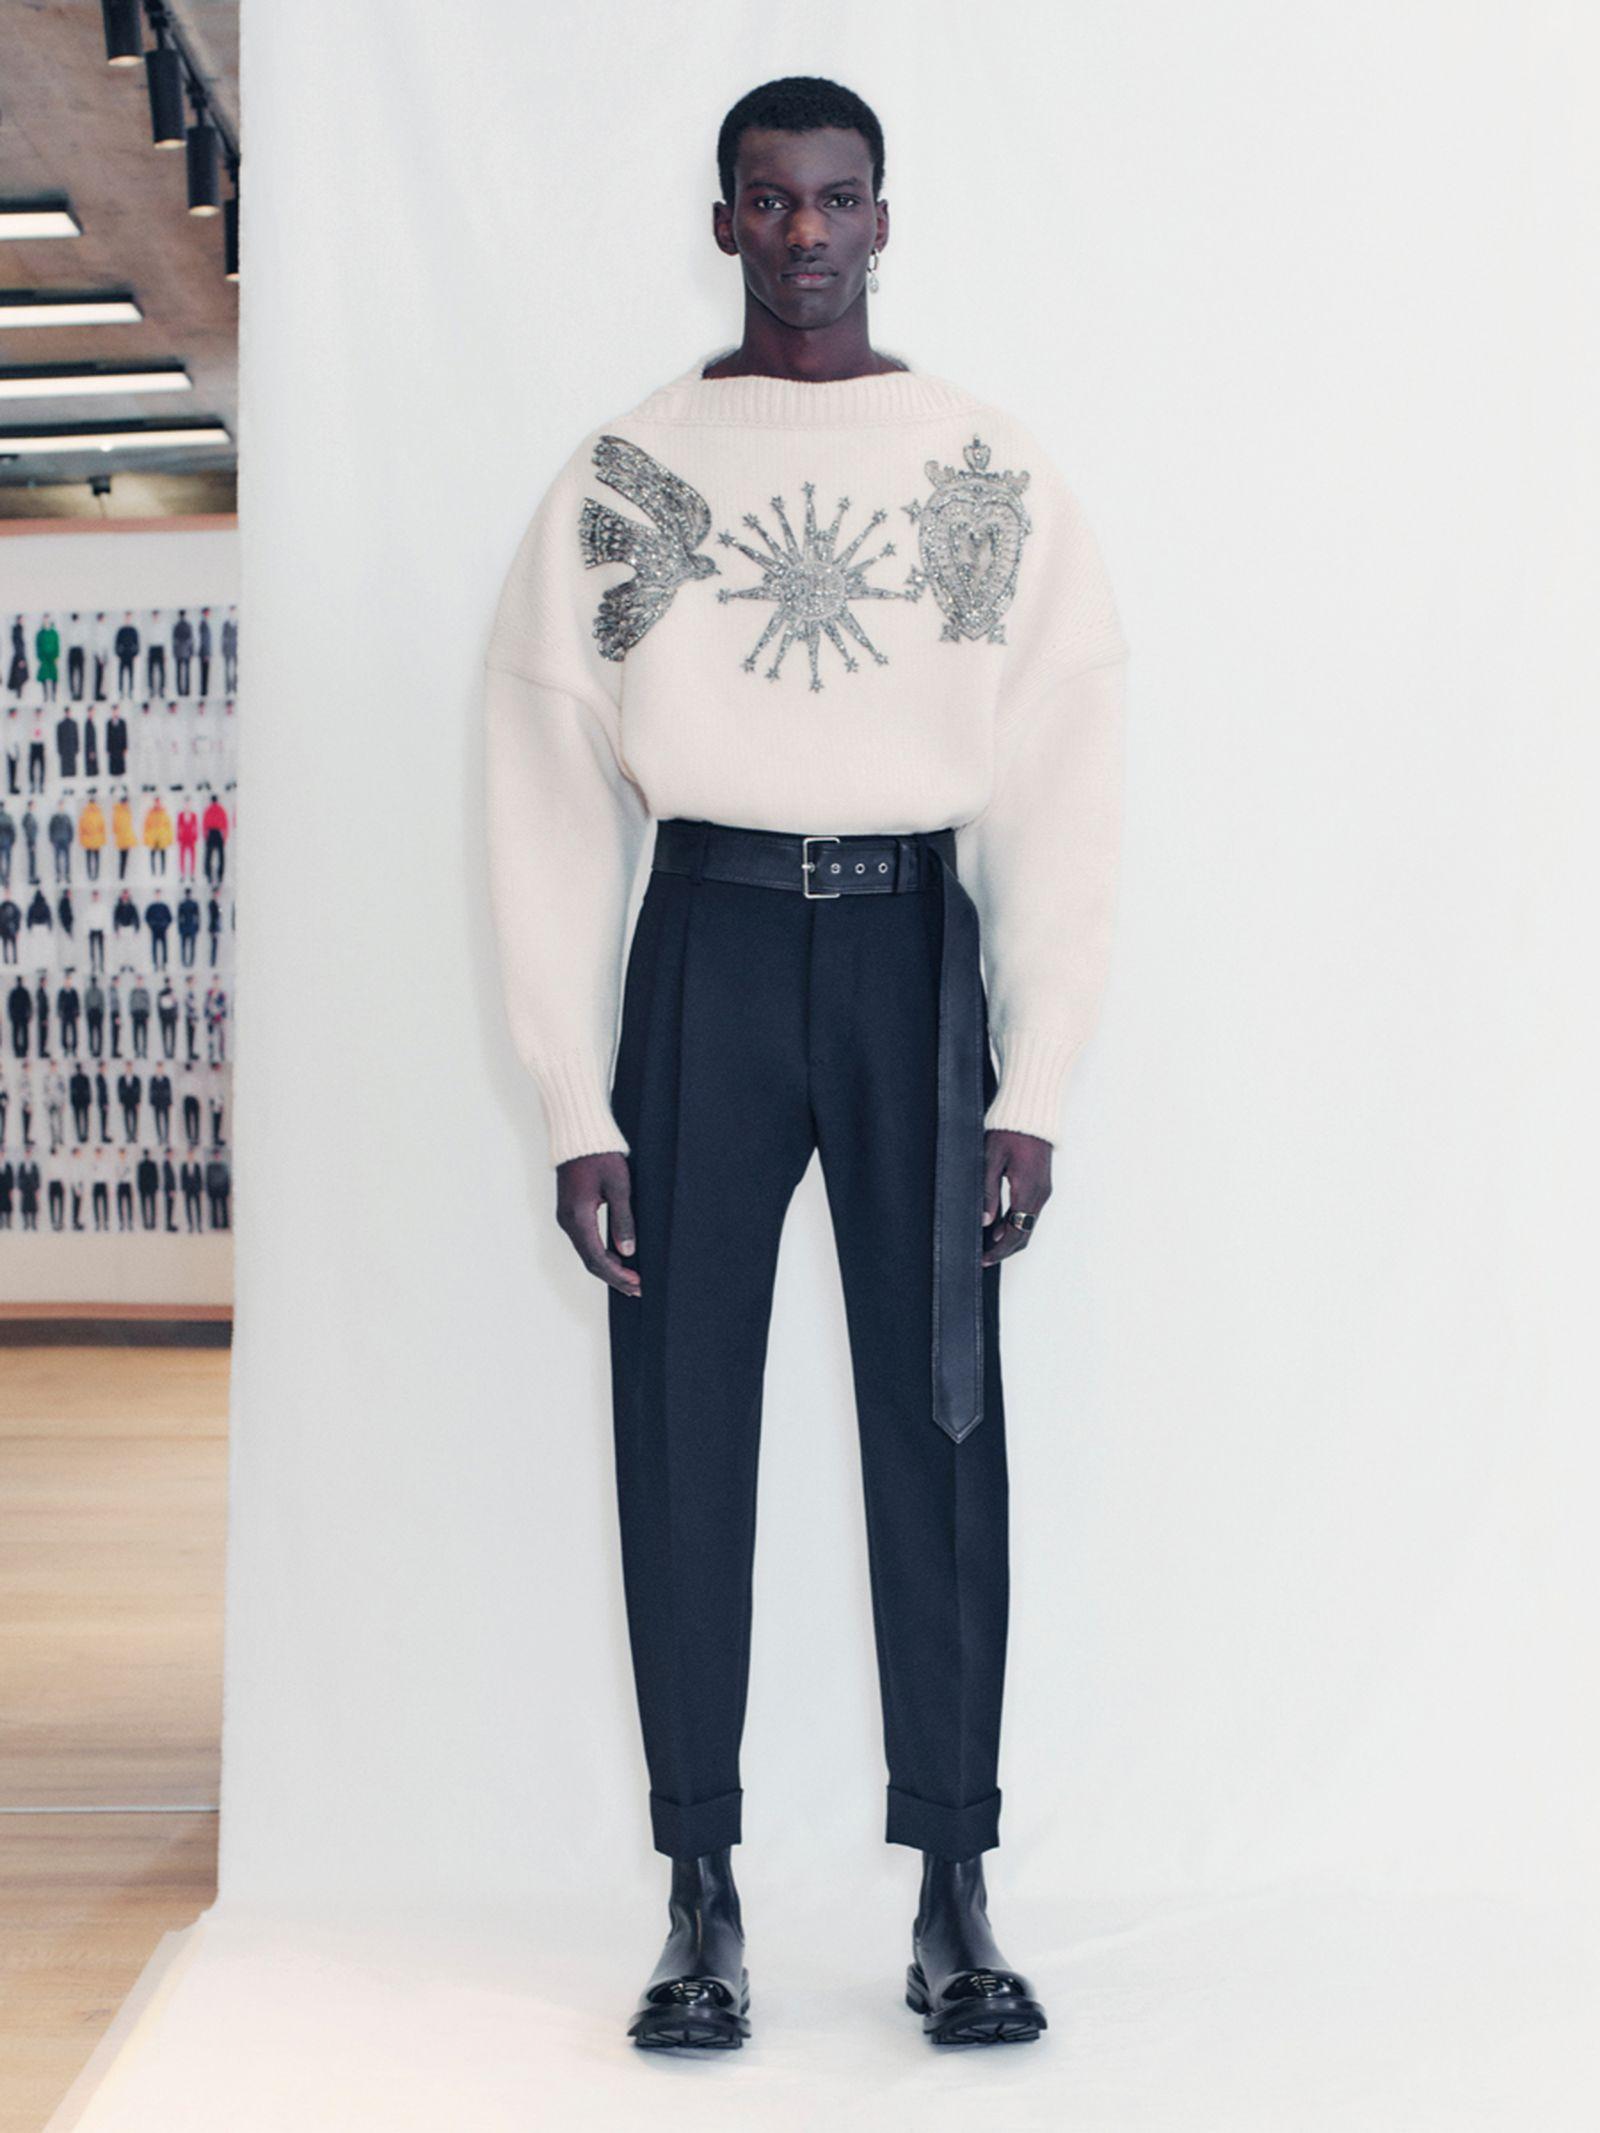 alexander-mcqueen-fall-winter-2021-collection- (20)